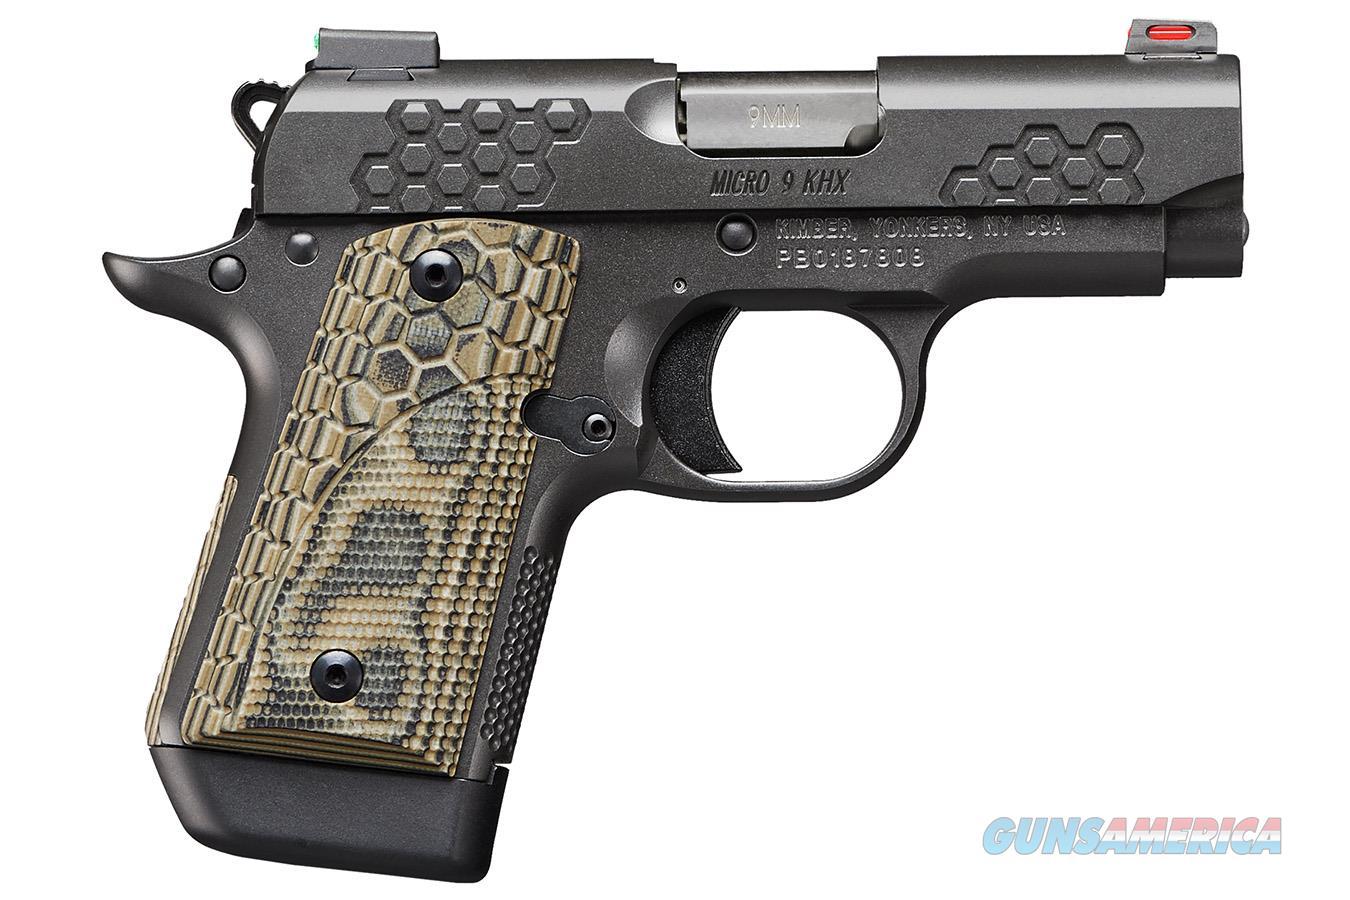 "Kimber Micro 9 KHX 9mm 3.15"" Fiber Optic 3300198  Guns > Pistols > Kimber of America Pistols > Micro 9"